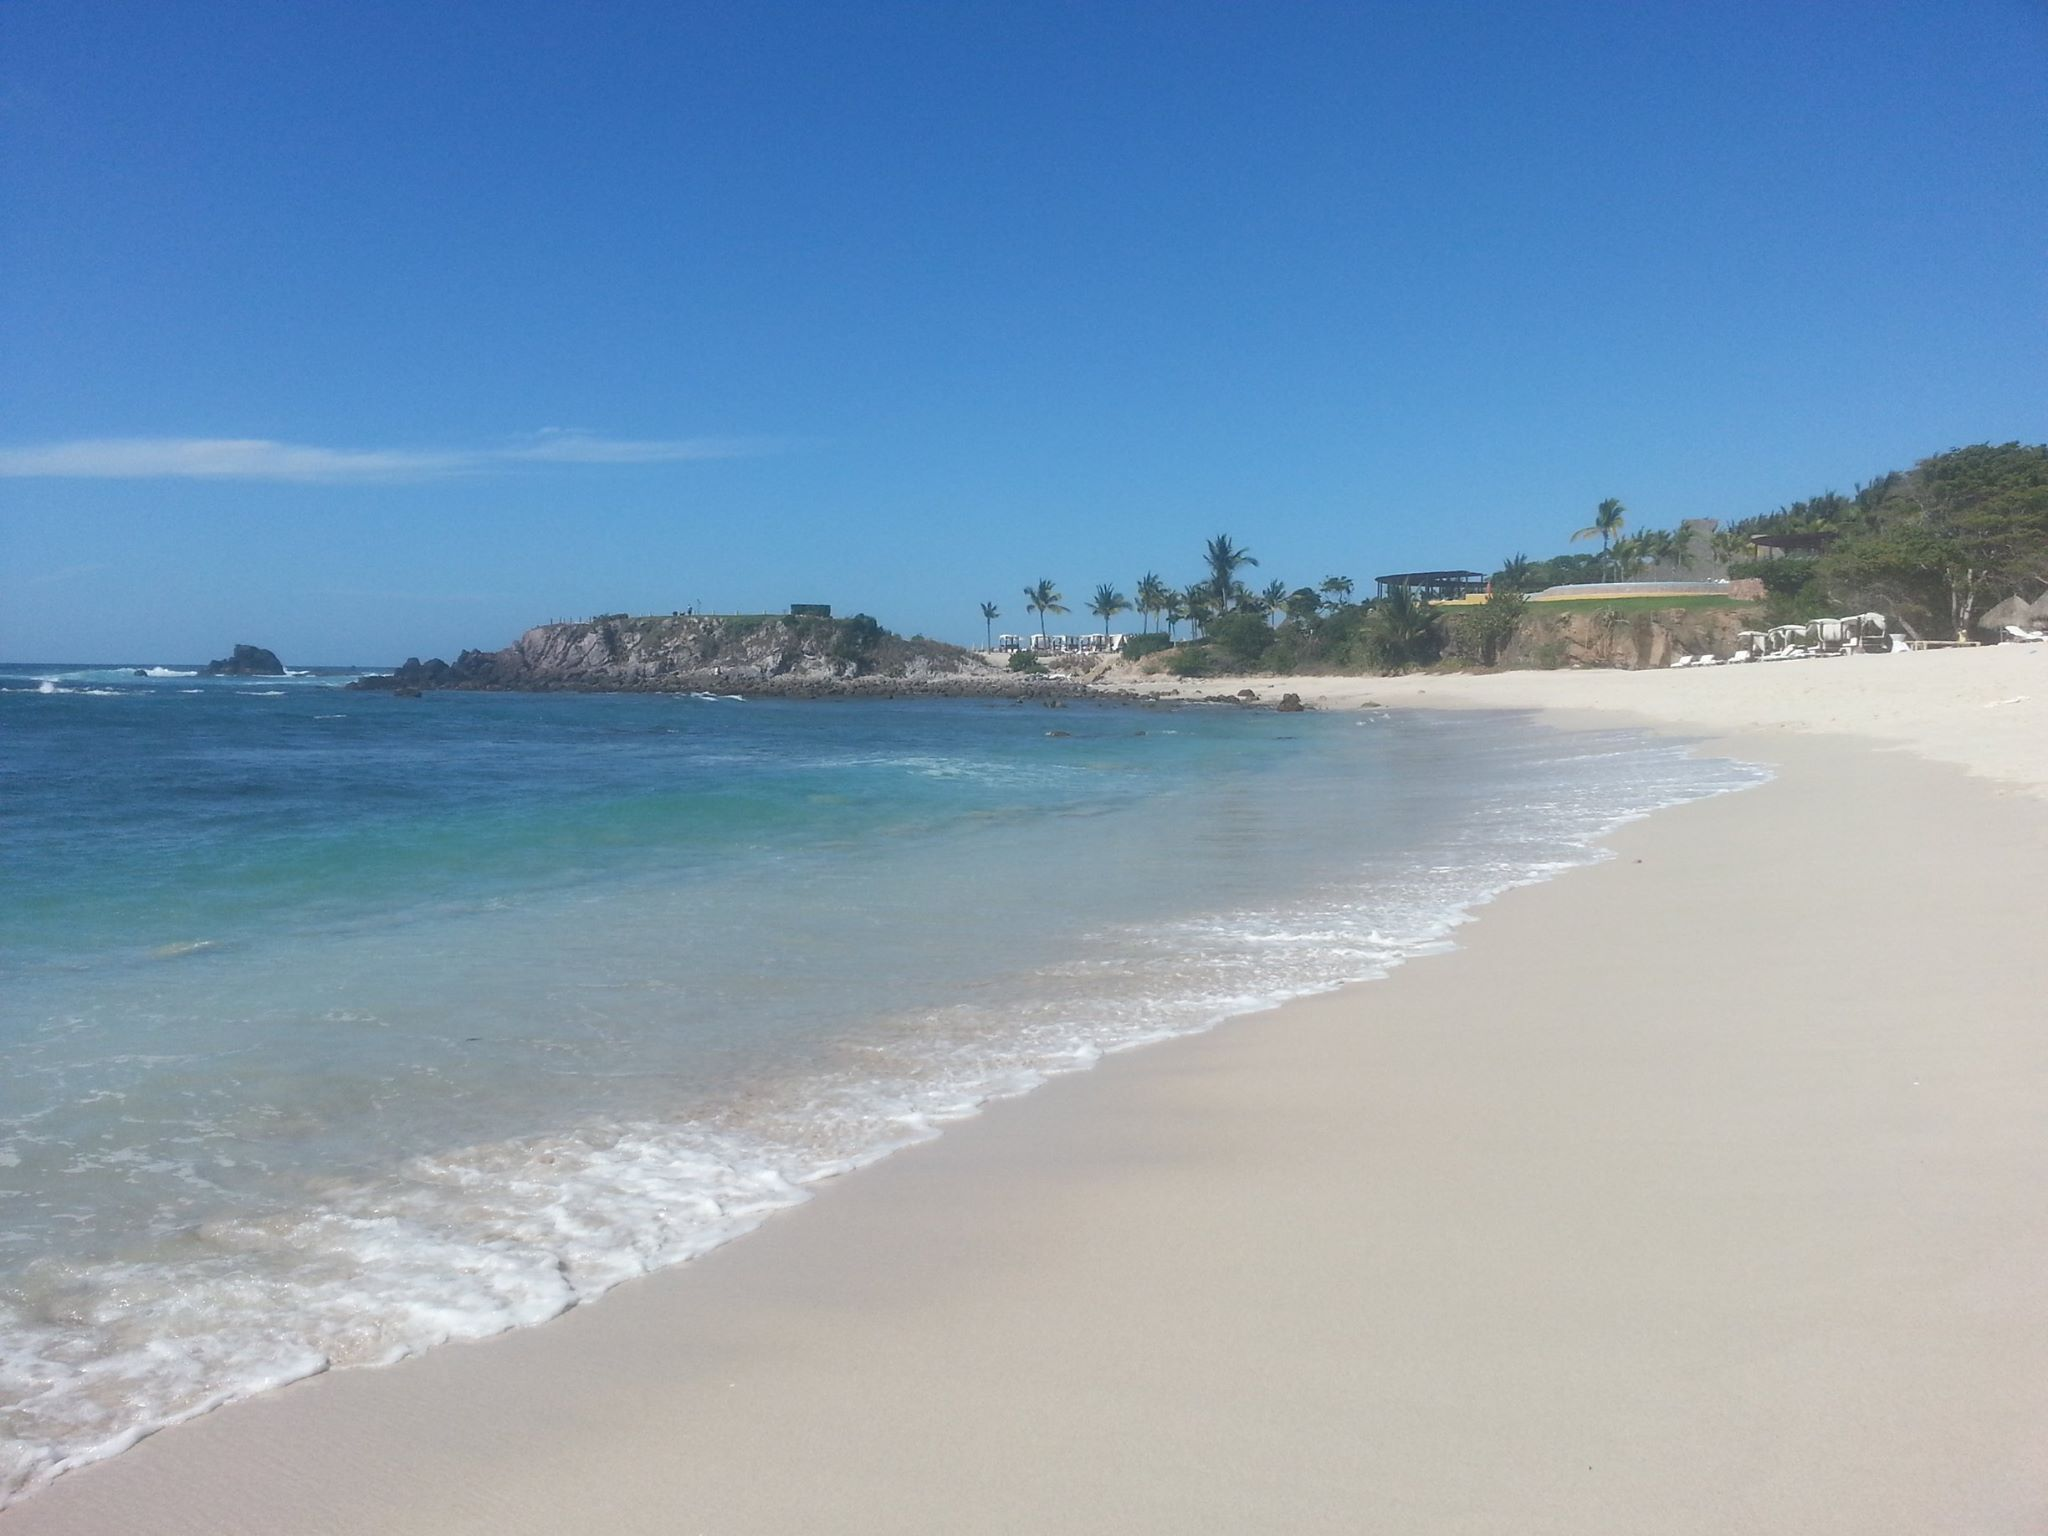 Beaches Of Puerto Vallarta Playa Anclote In Punta De Mita Nayarit Mexico Puerto Vallarta Beach Vacay Vallarta